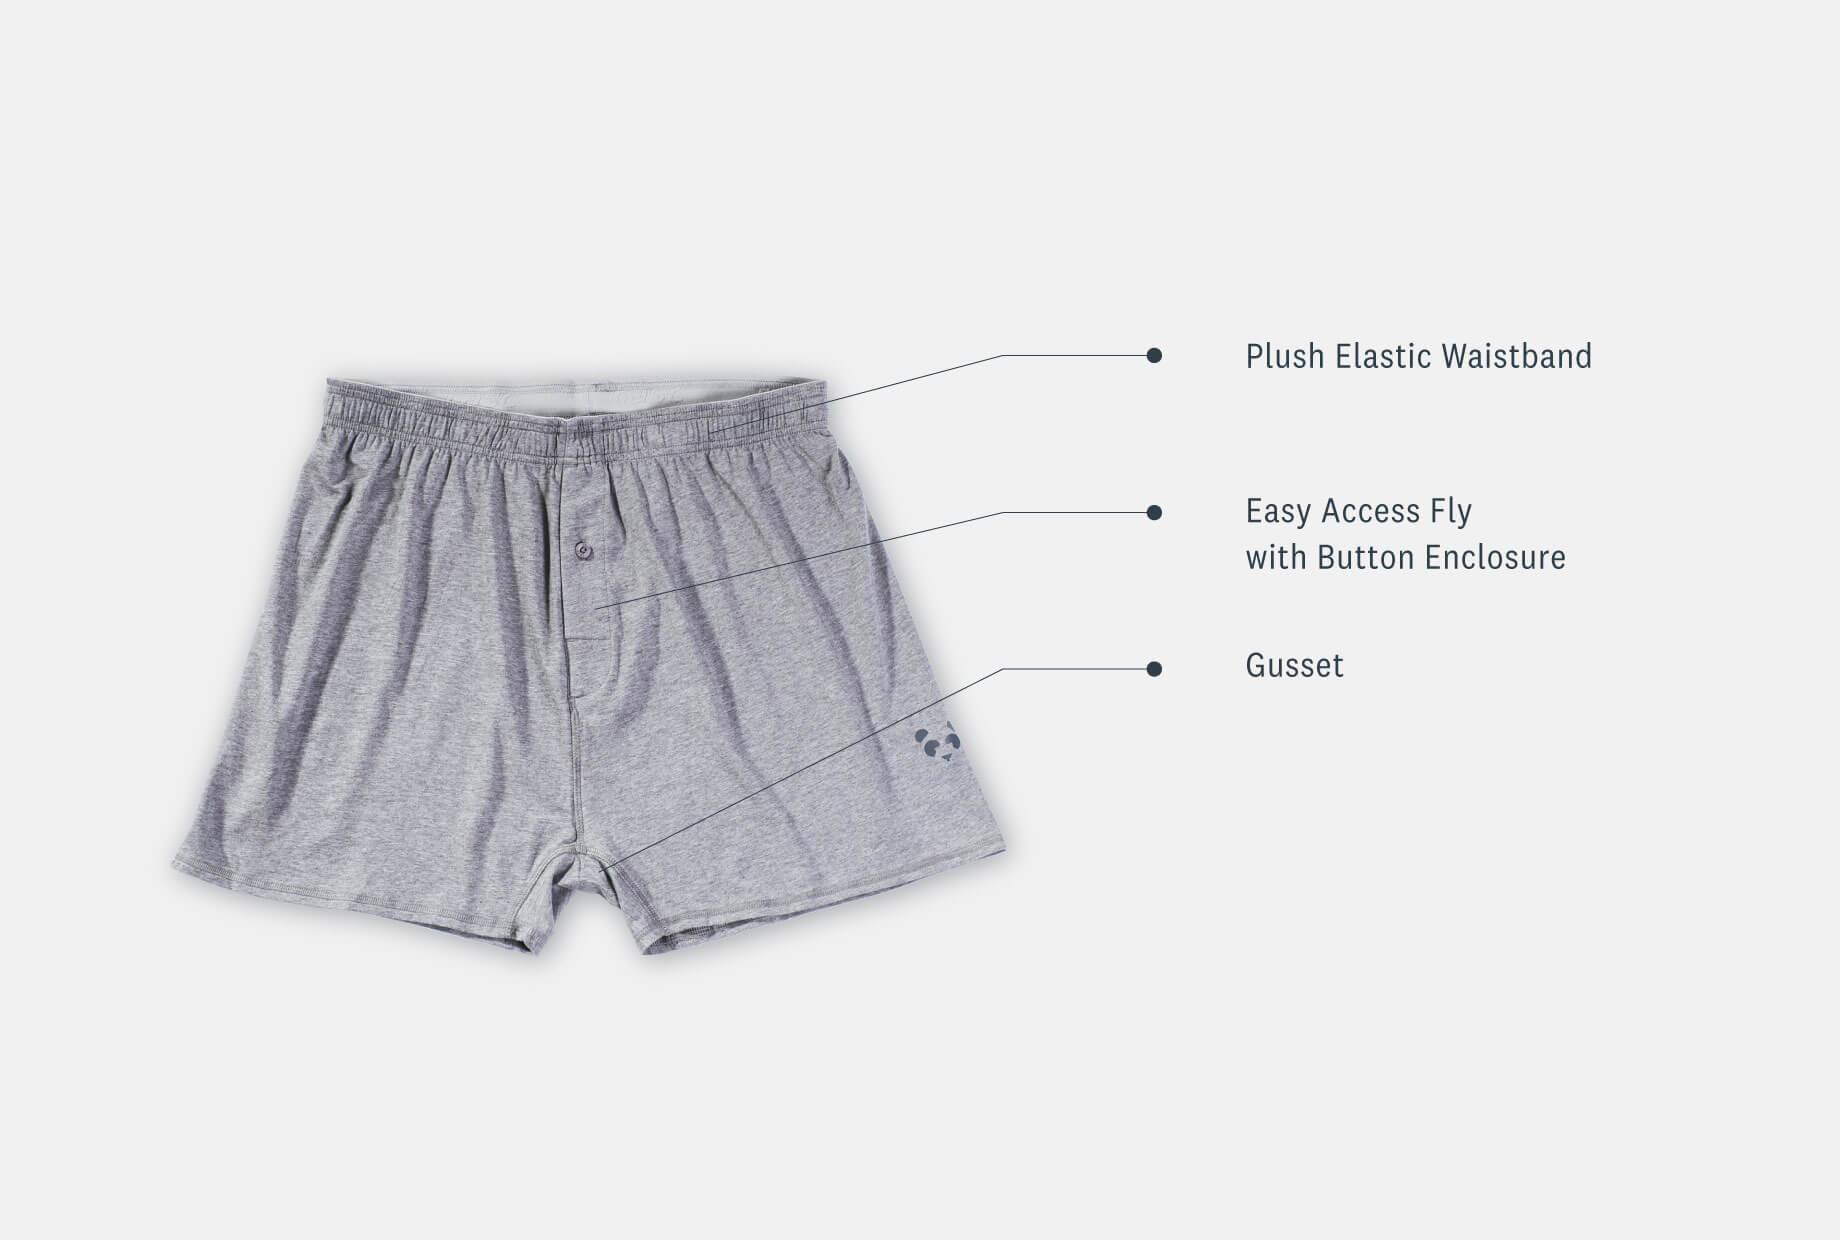 Men's Bamboo Bam(Bare) Loose Fit Boxer Underwear - tasc Performance